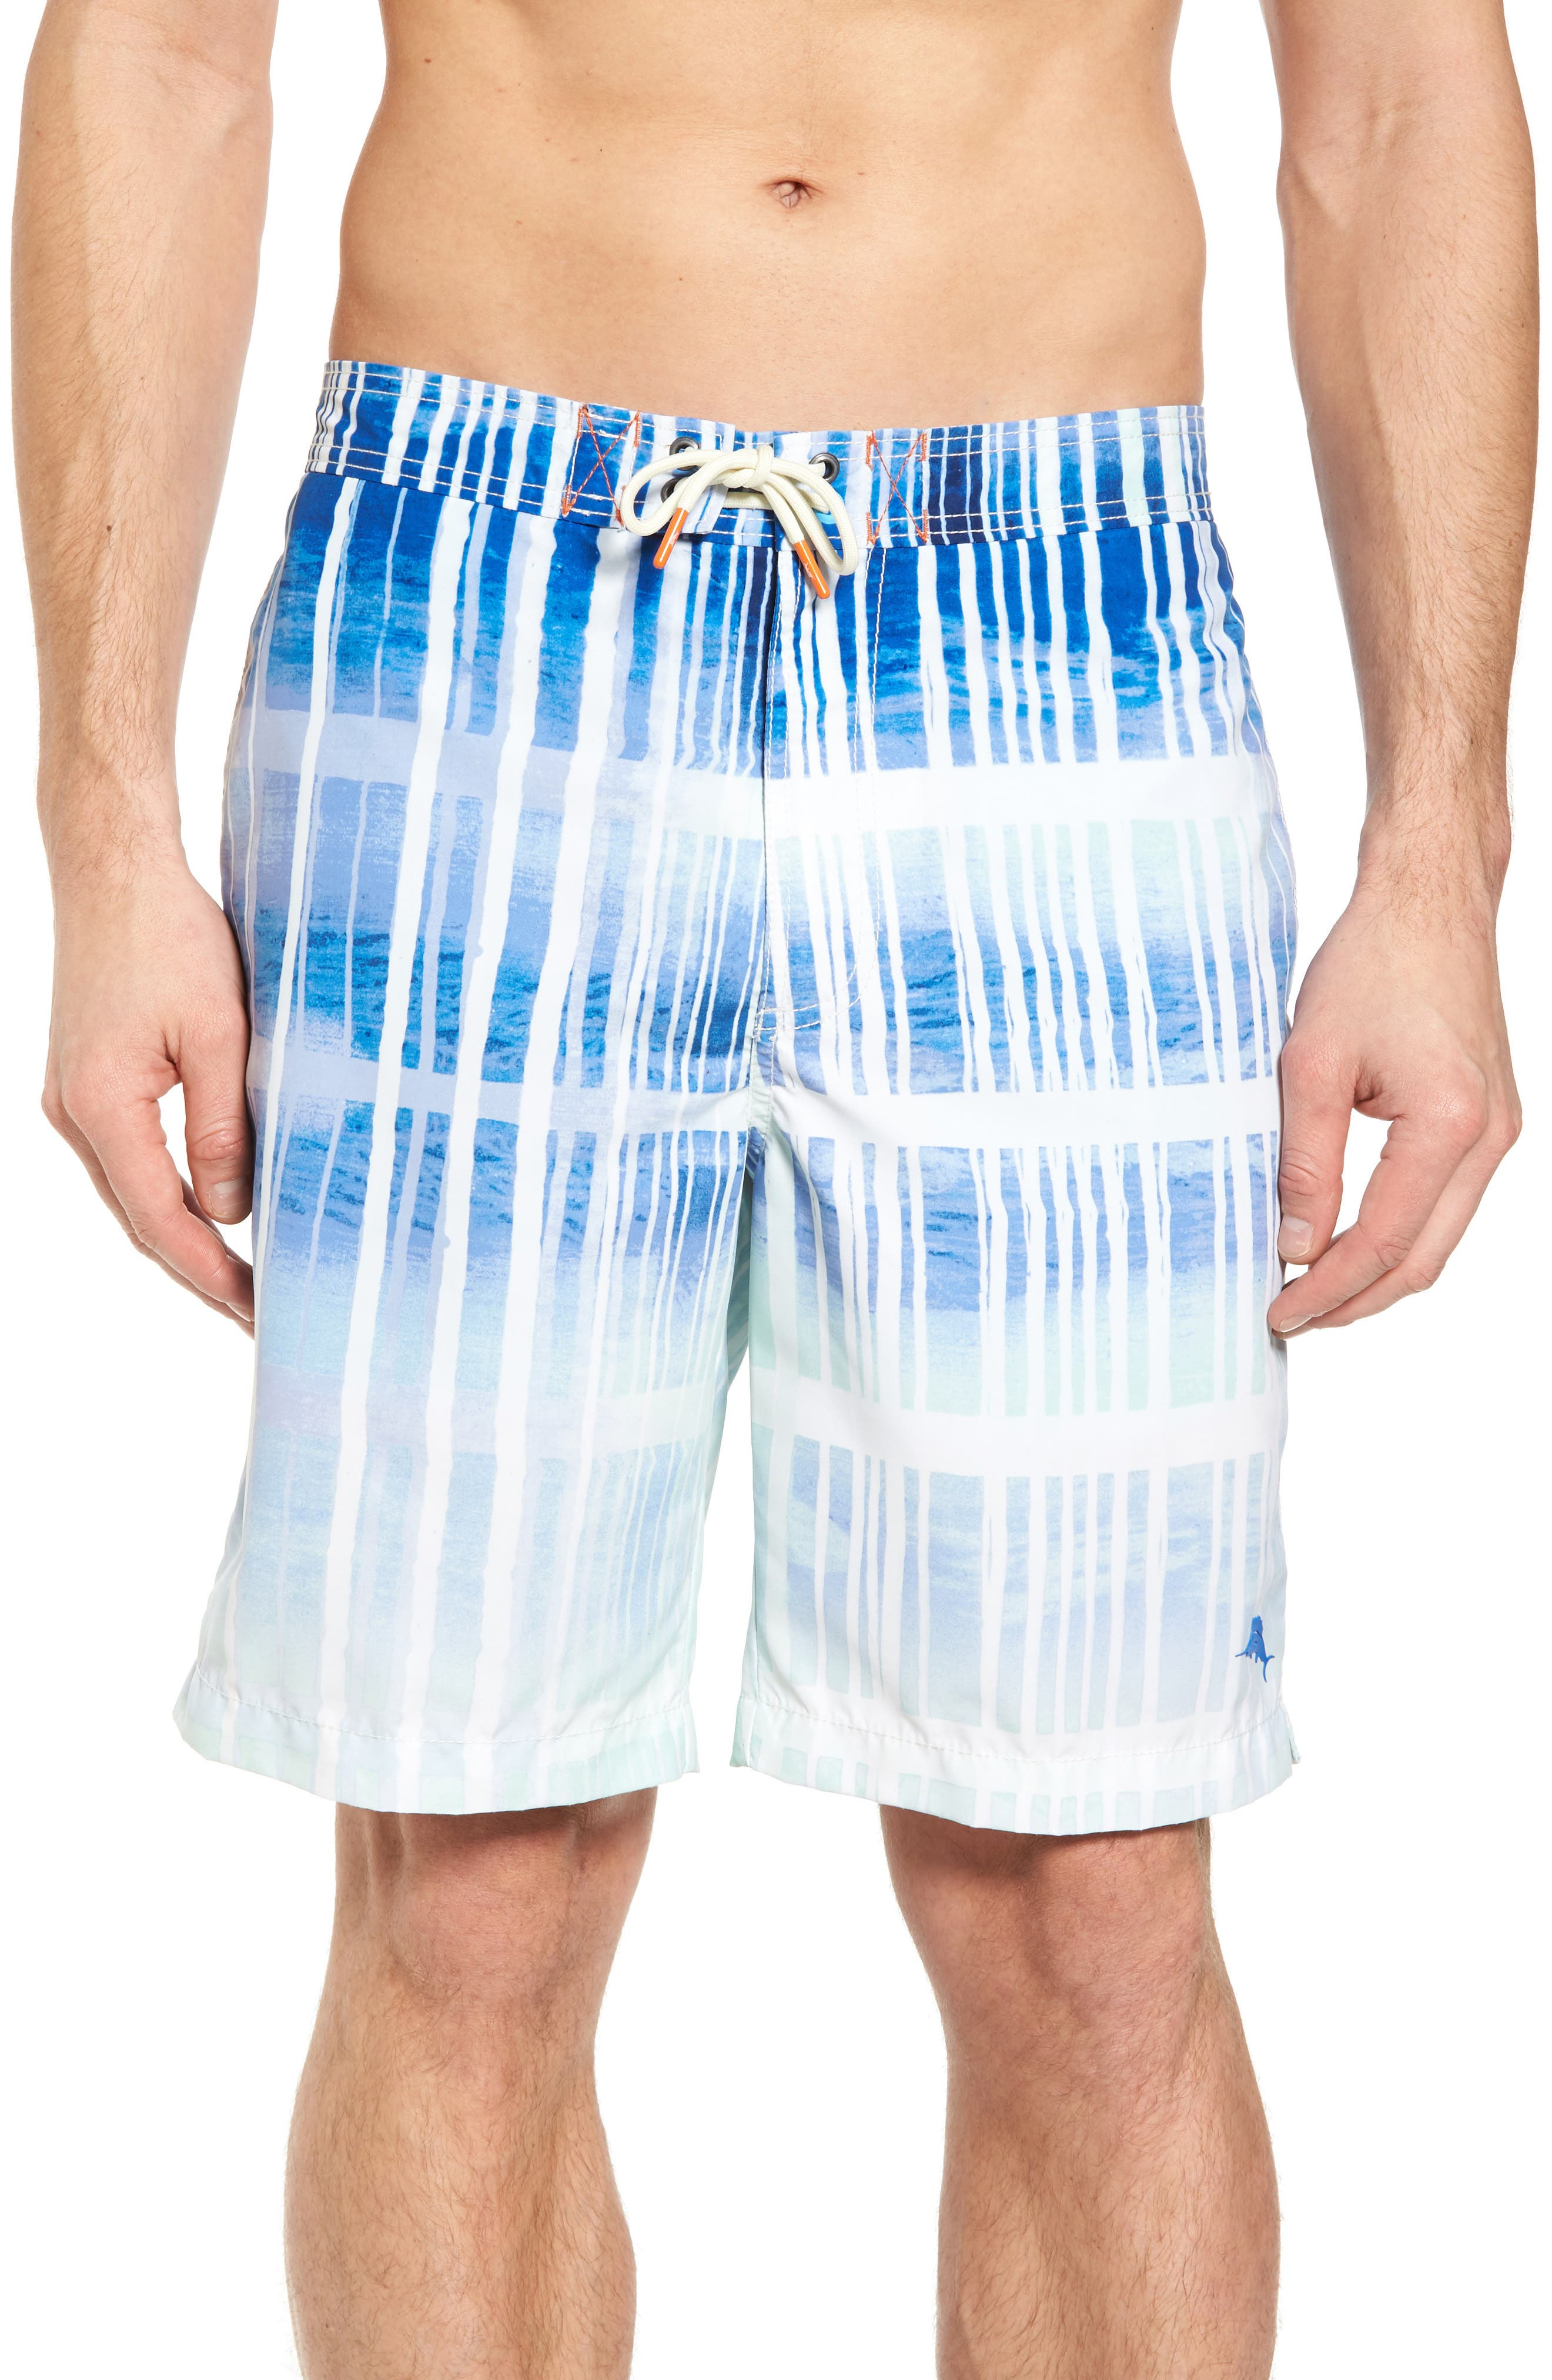 Baja Okeechobee Board Shorts,                             Main thumbnail 1, color,                             Santorini Blue